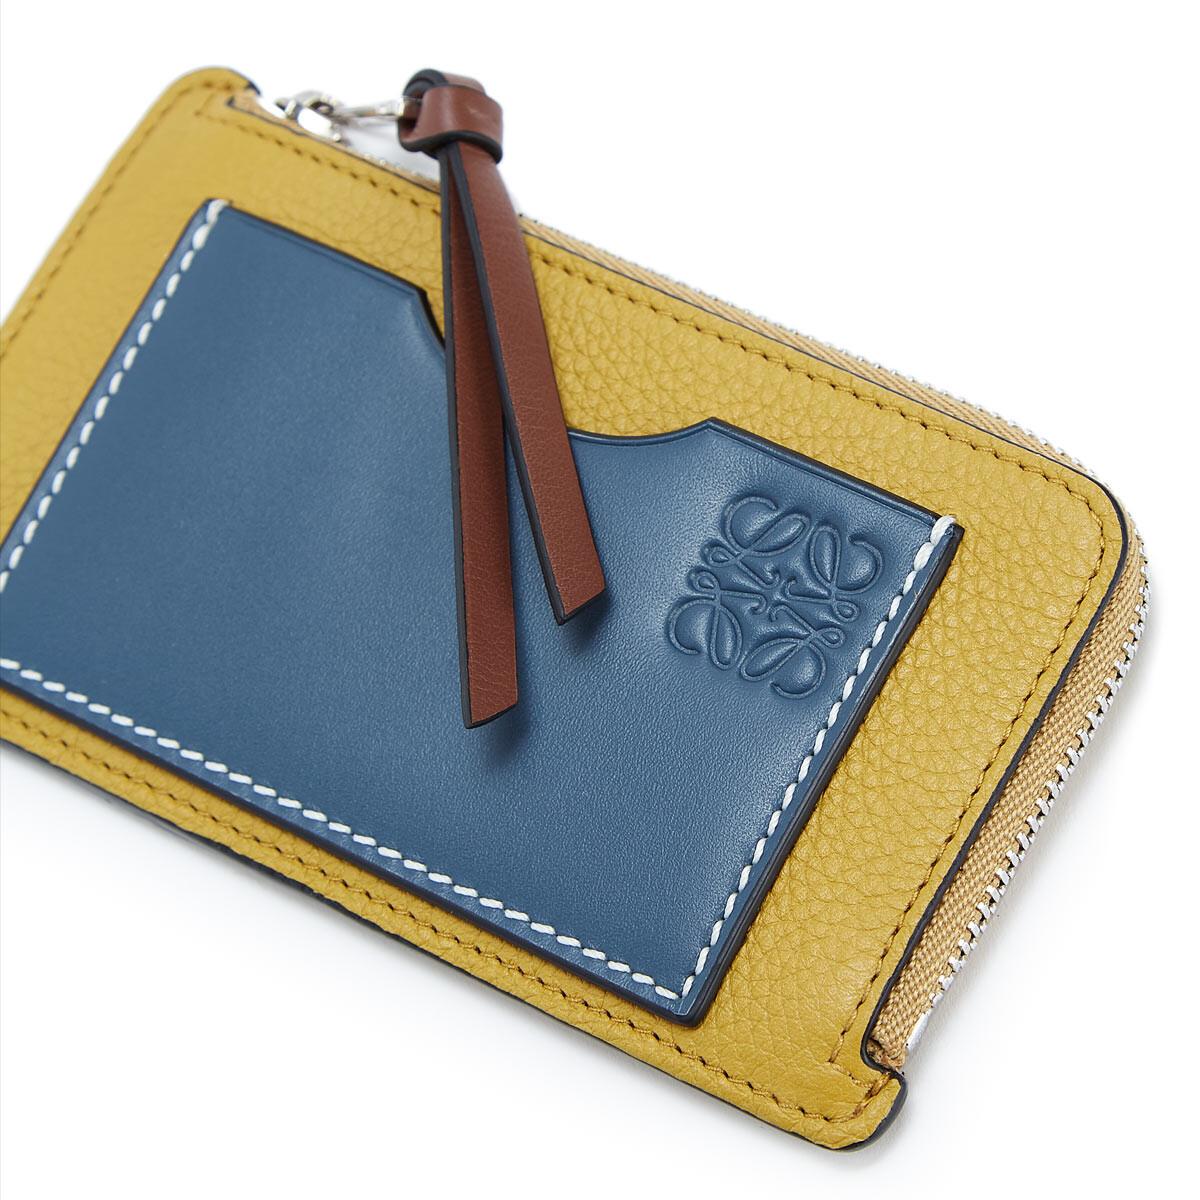 LOEWE コイン/カードホルダーラージ Ochre/Steel Blue  front